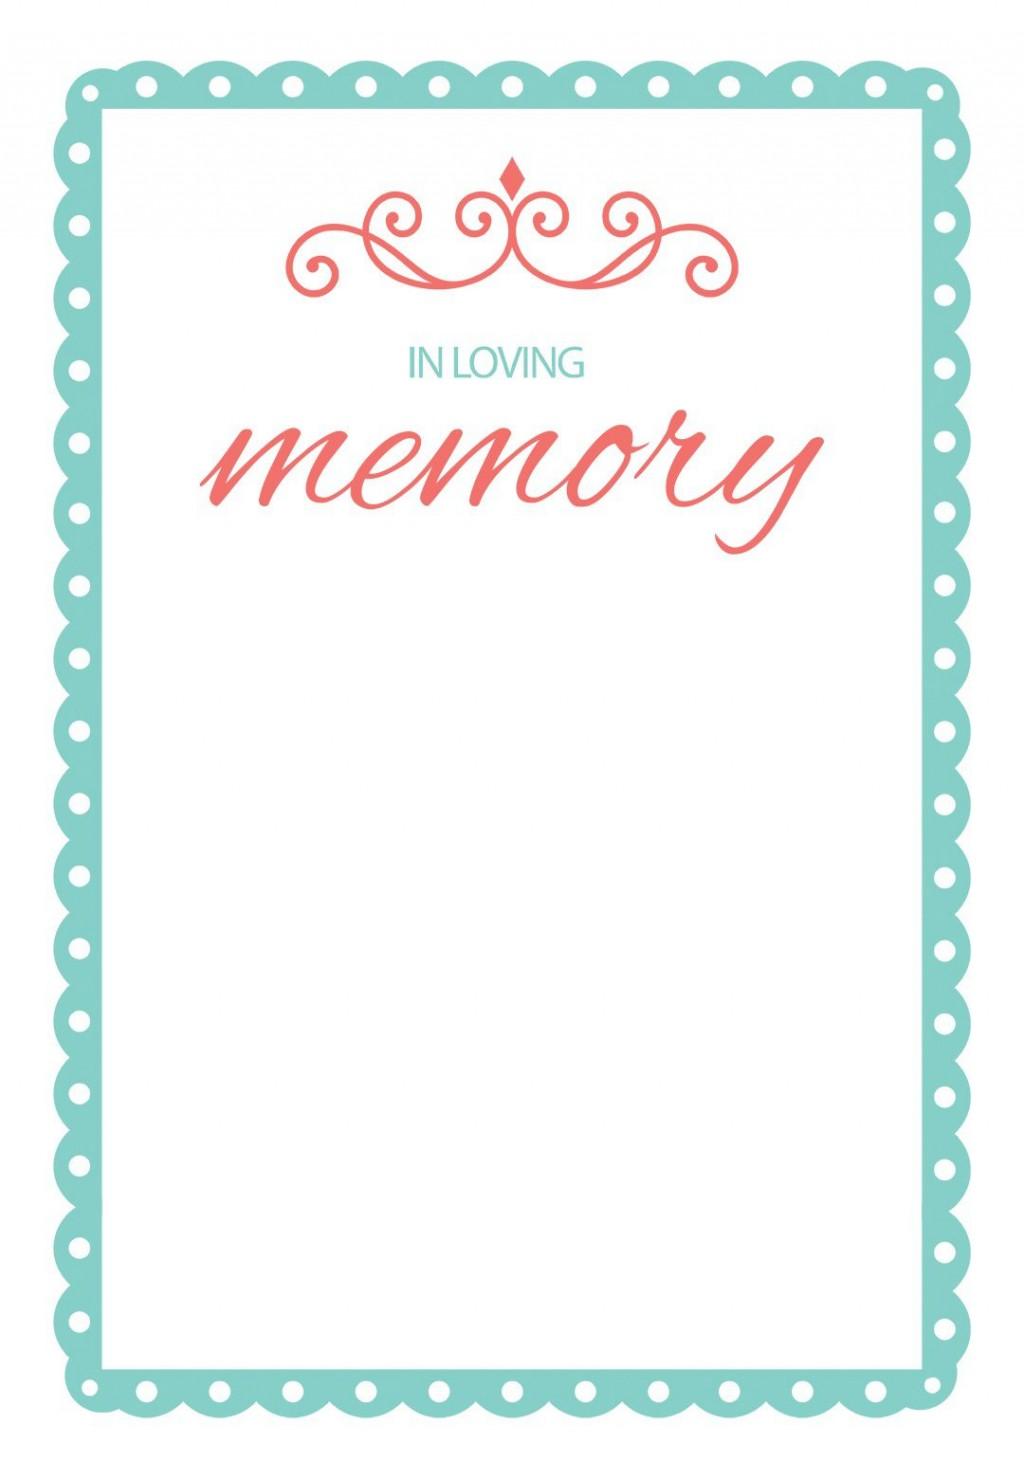 000 Impressive In Loving Memory Template Design  Free Download Card BookmarkLarge